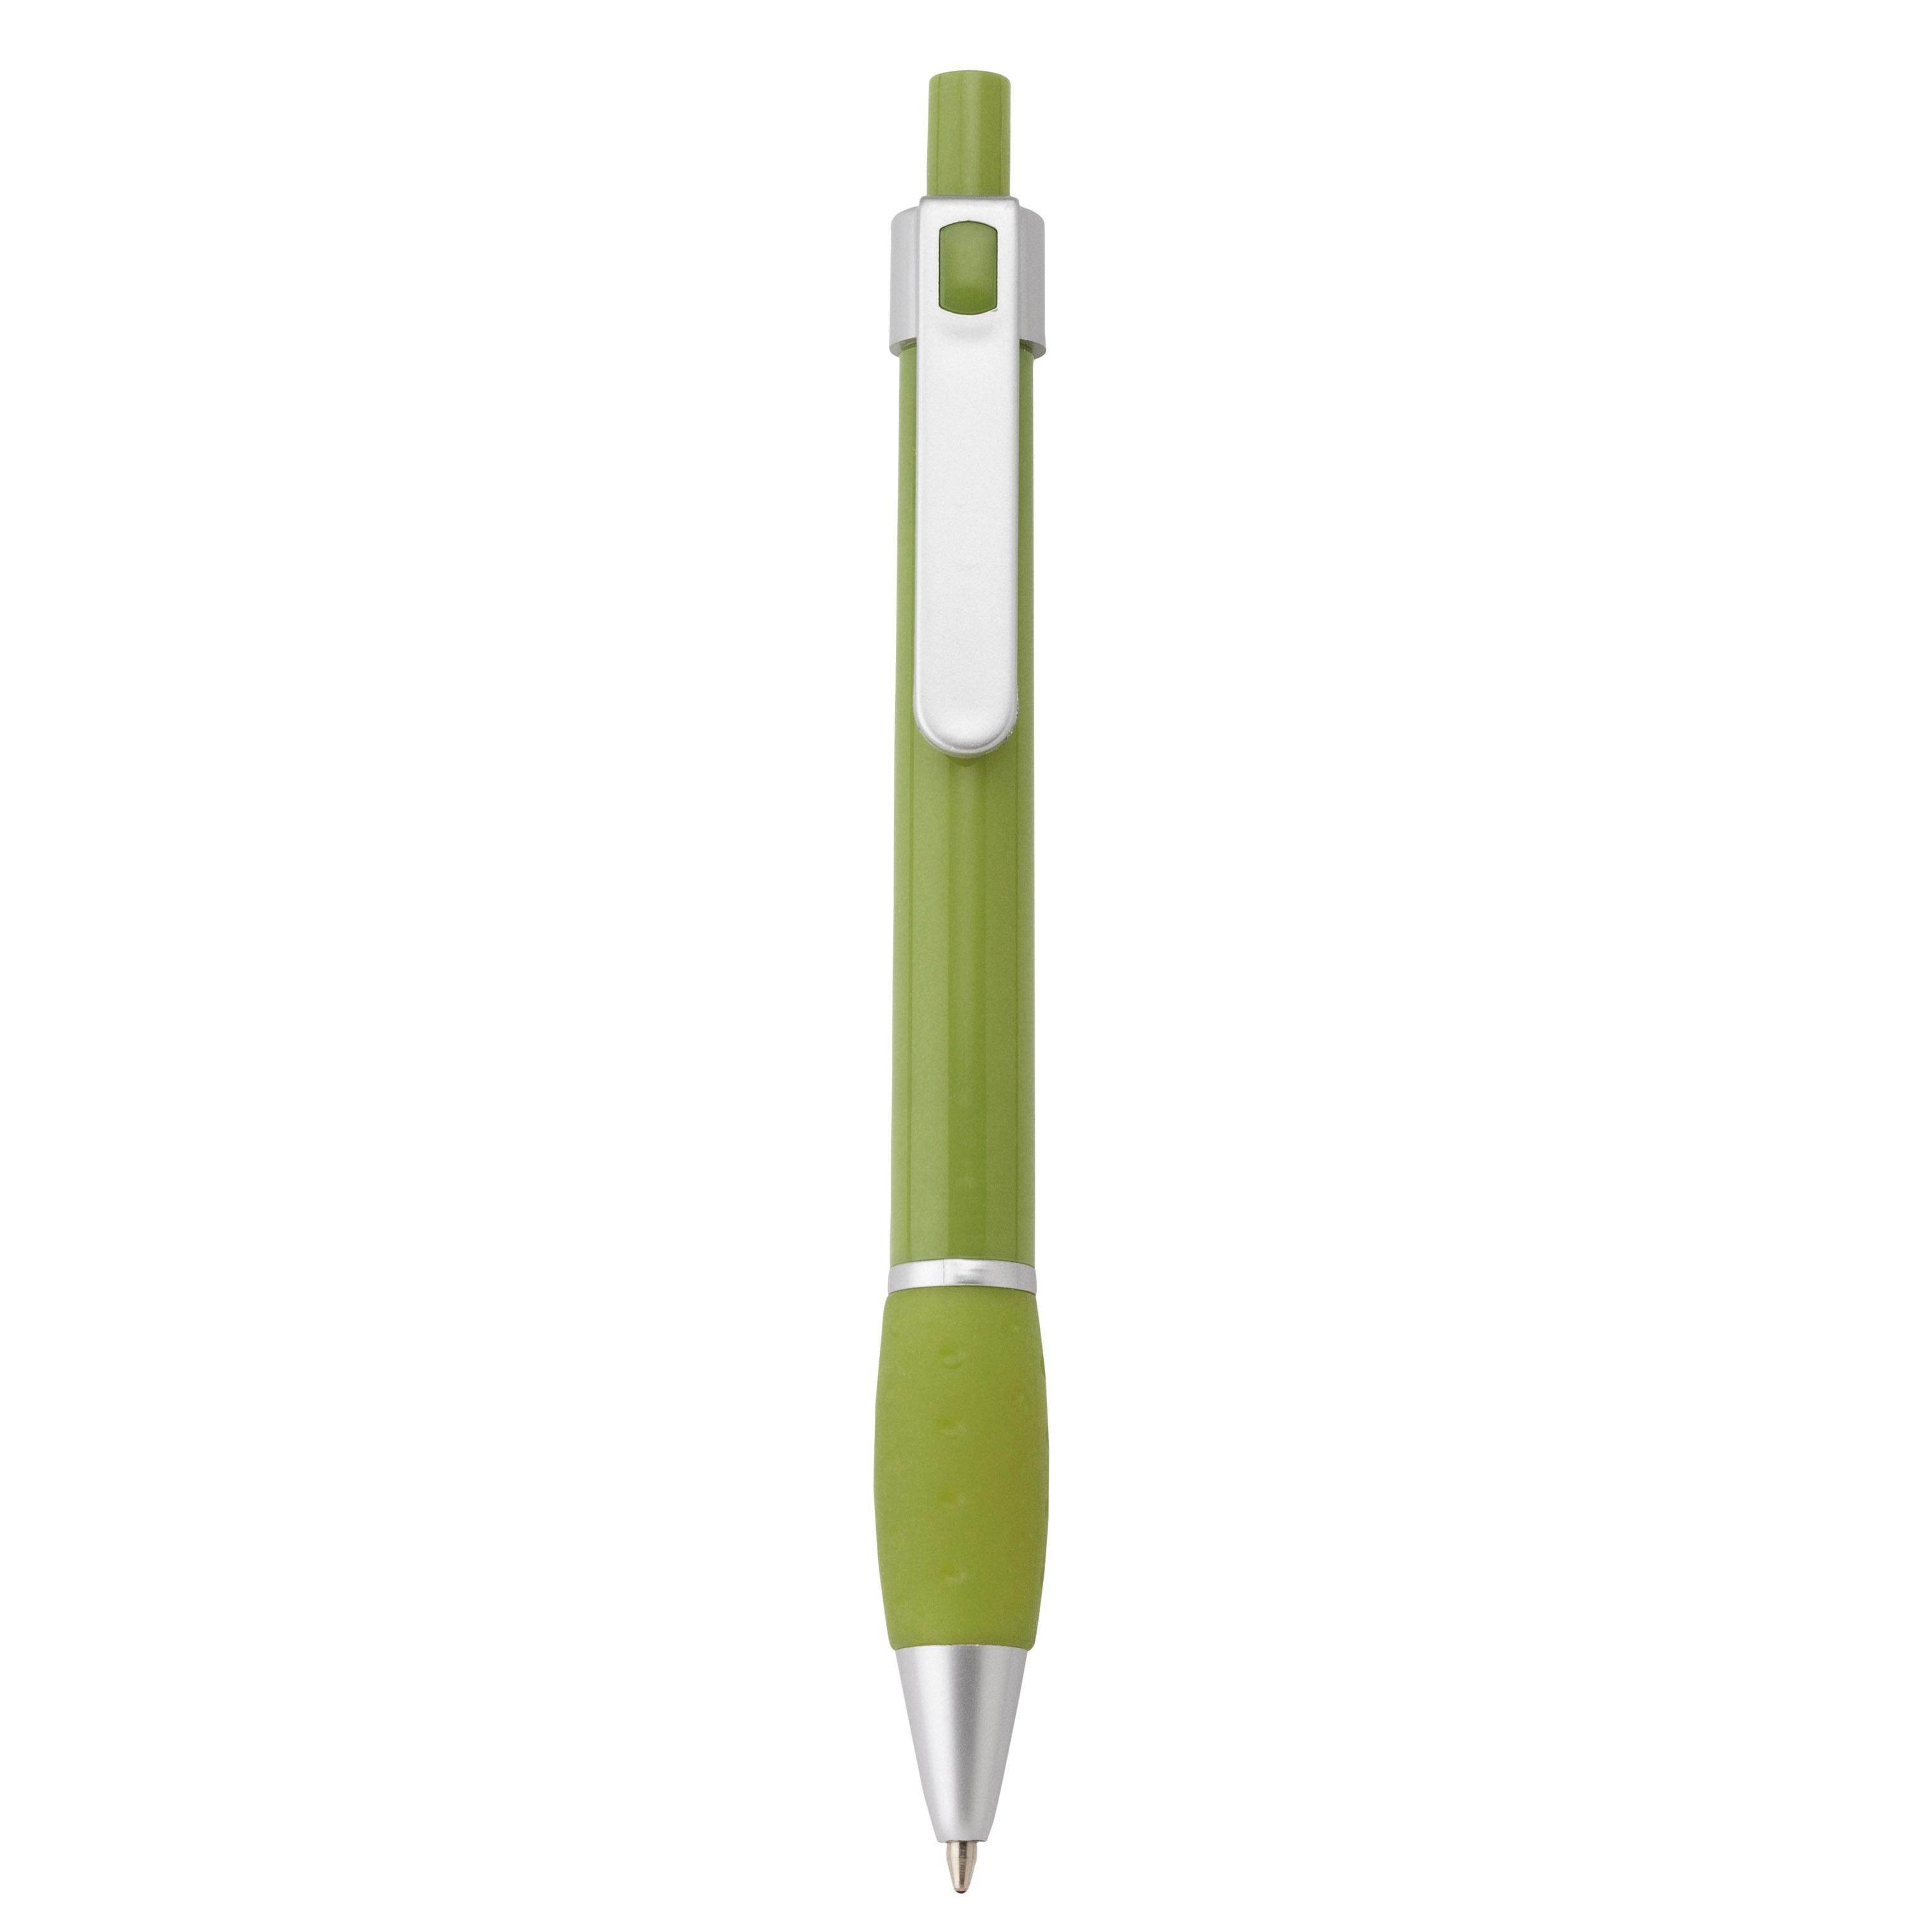 Nova Glossy Ballpoint Pen